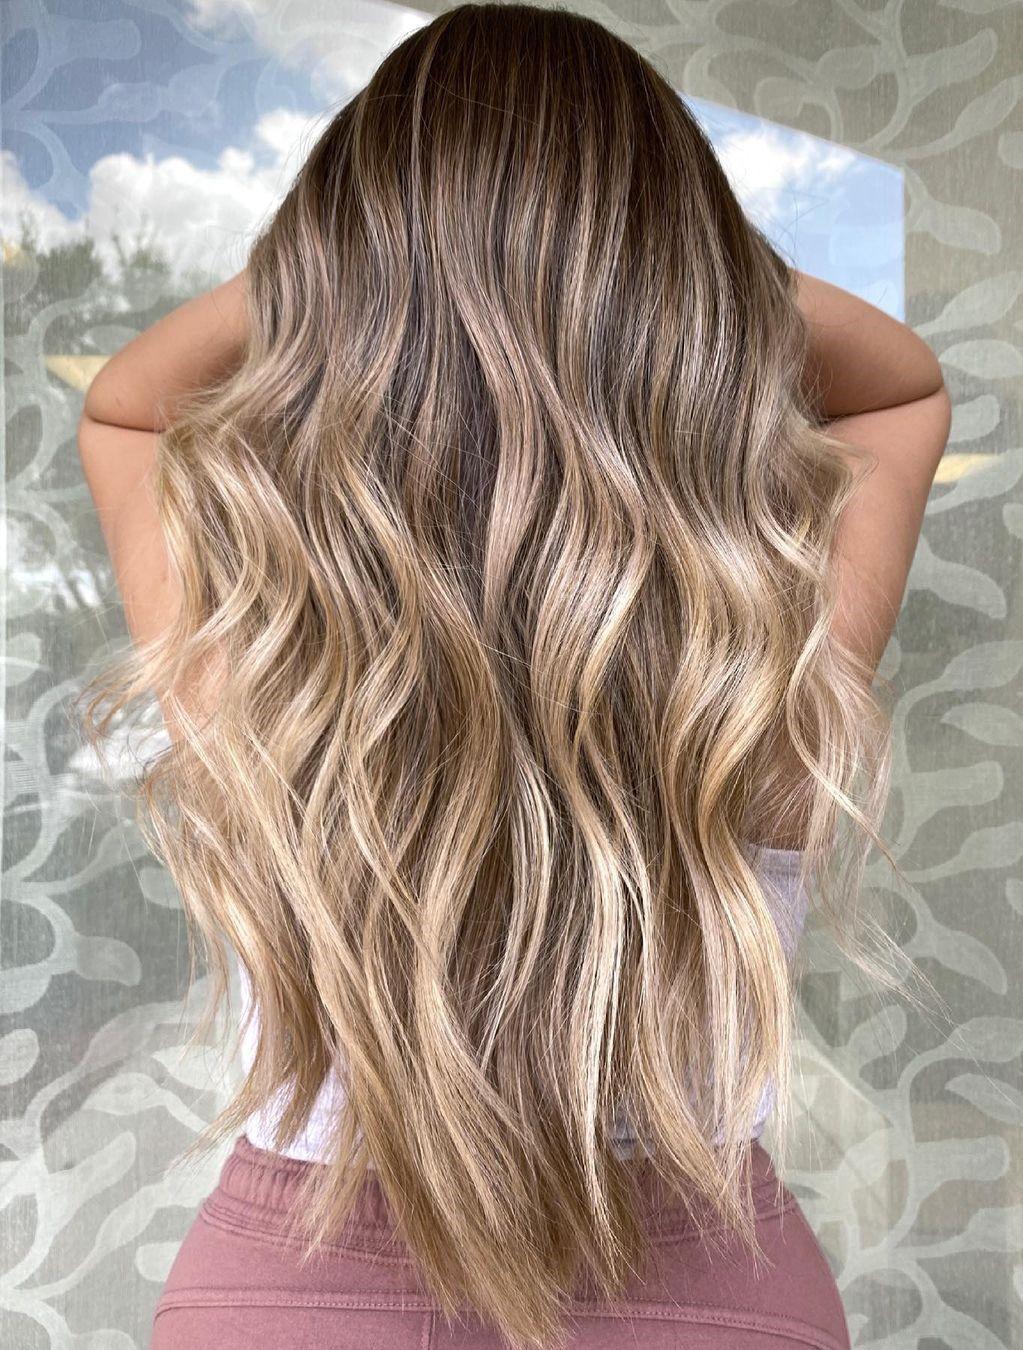 Sun-Kissed V-Haircut with Beach Waves